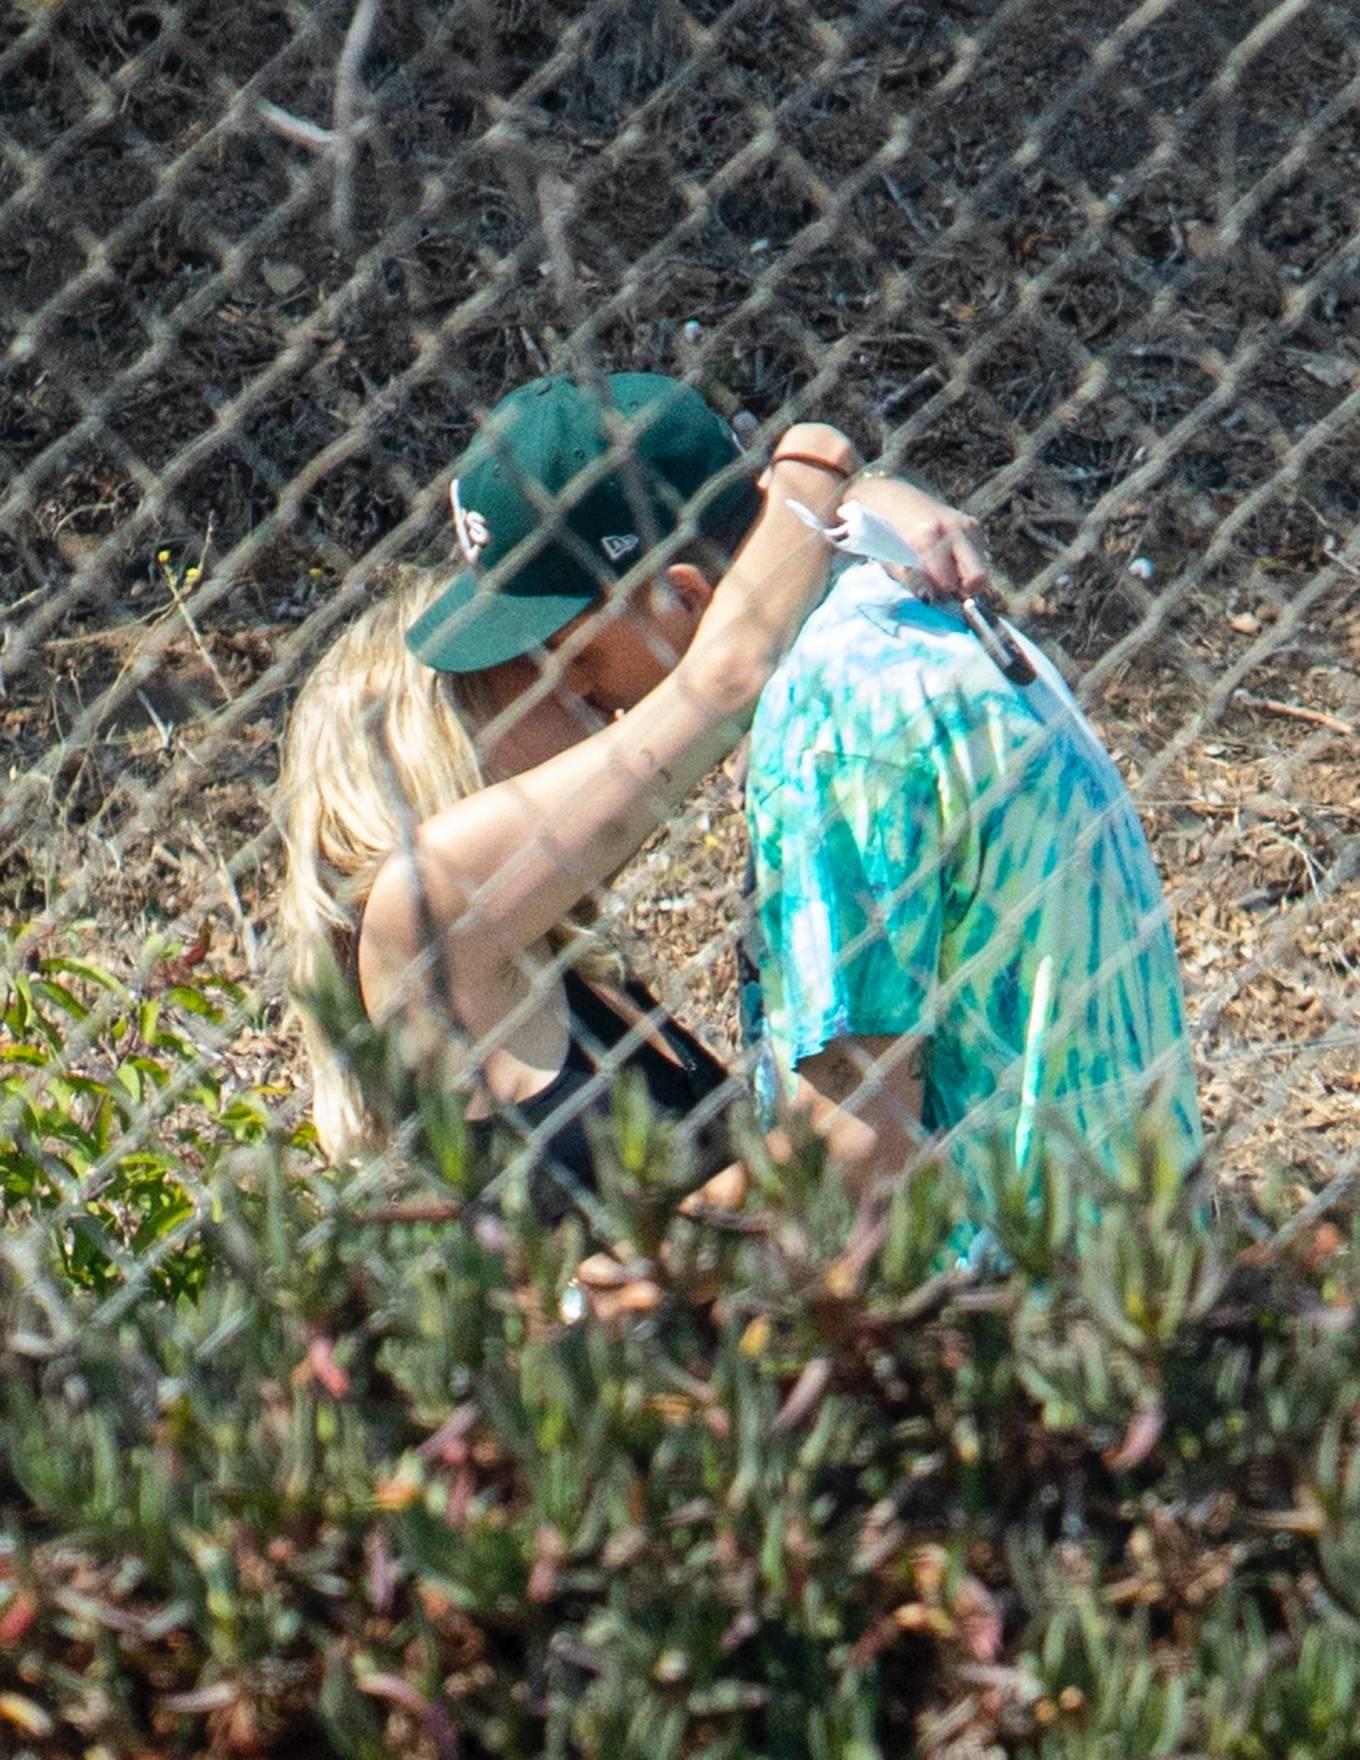 Ashley Benson 2020 : Ashley Benson and boyfriend G-Eazy as she arrives at his video shoot in Malibu-12